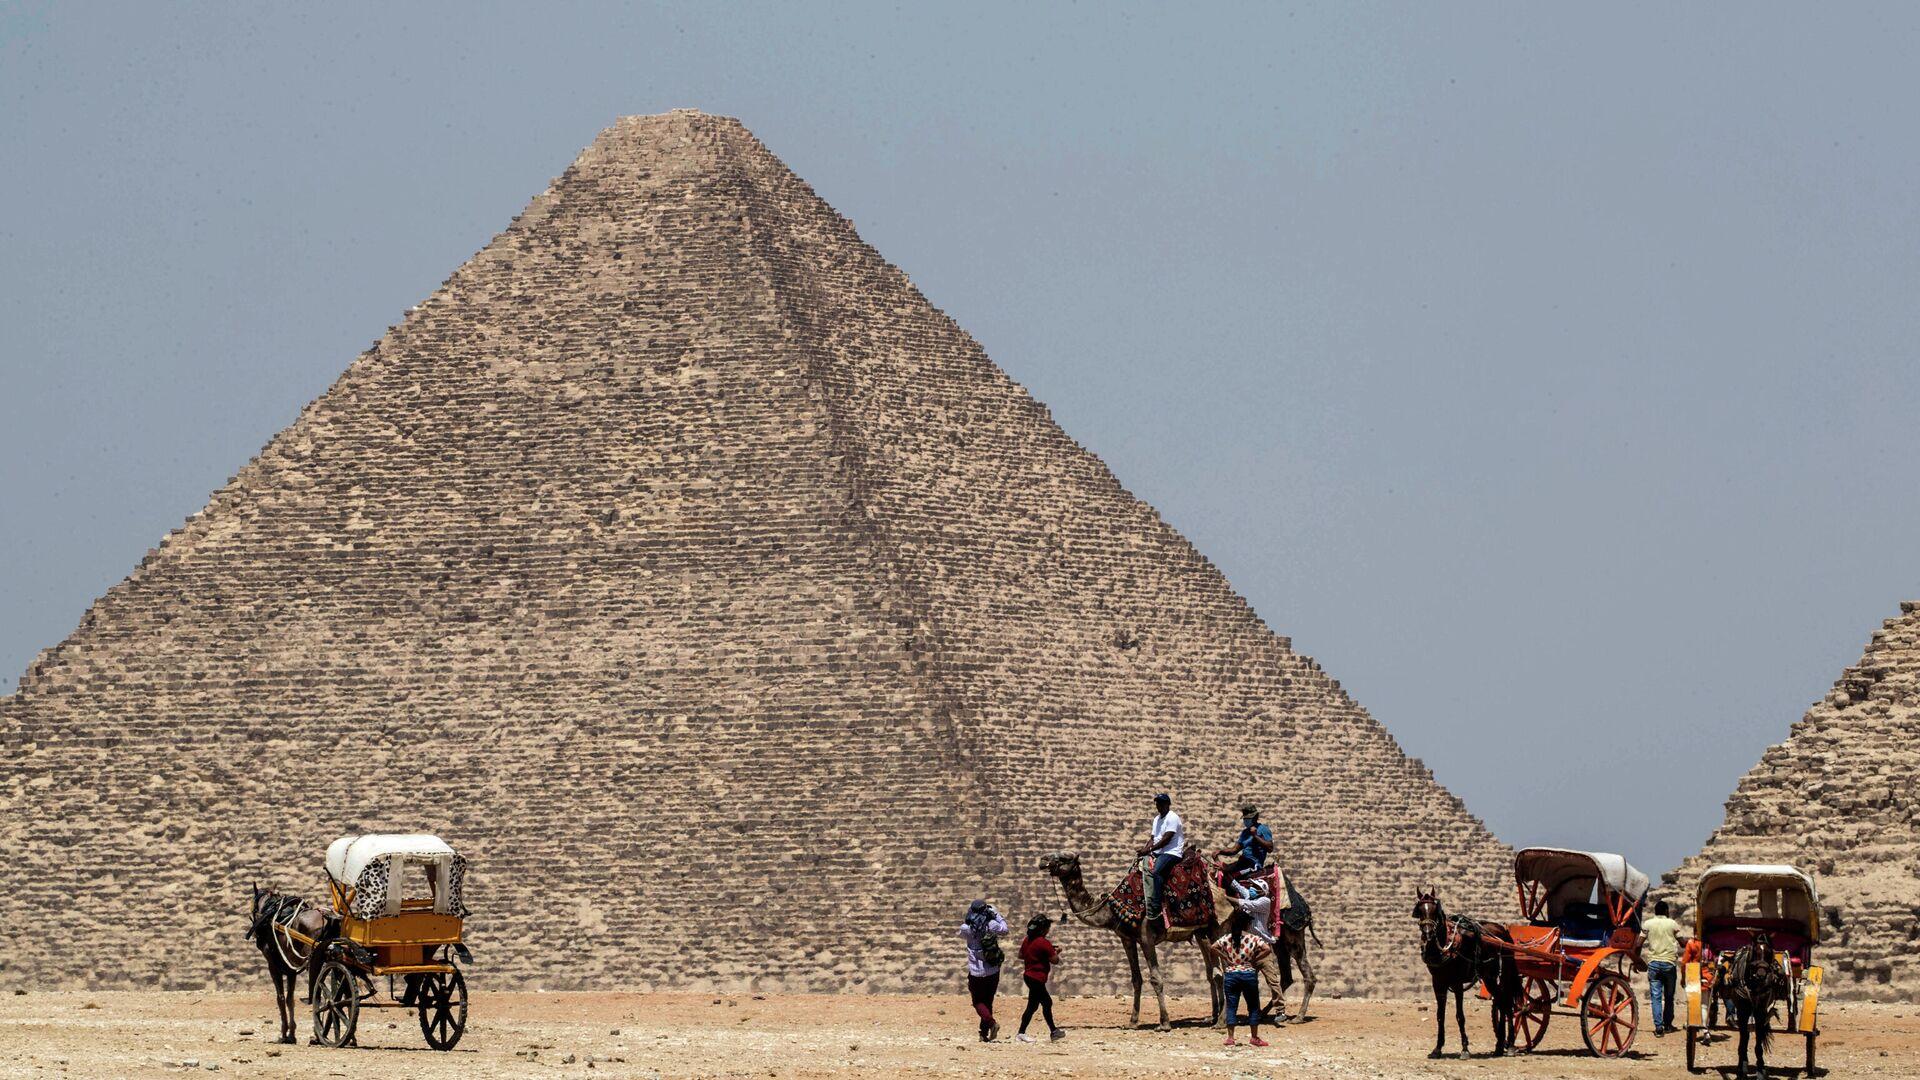 Cheops-Pyramide in Ägypten (Archiv) - SNA, 1920, 16.12.2020